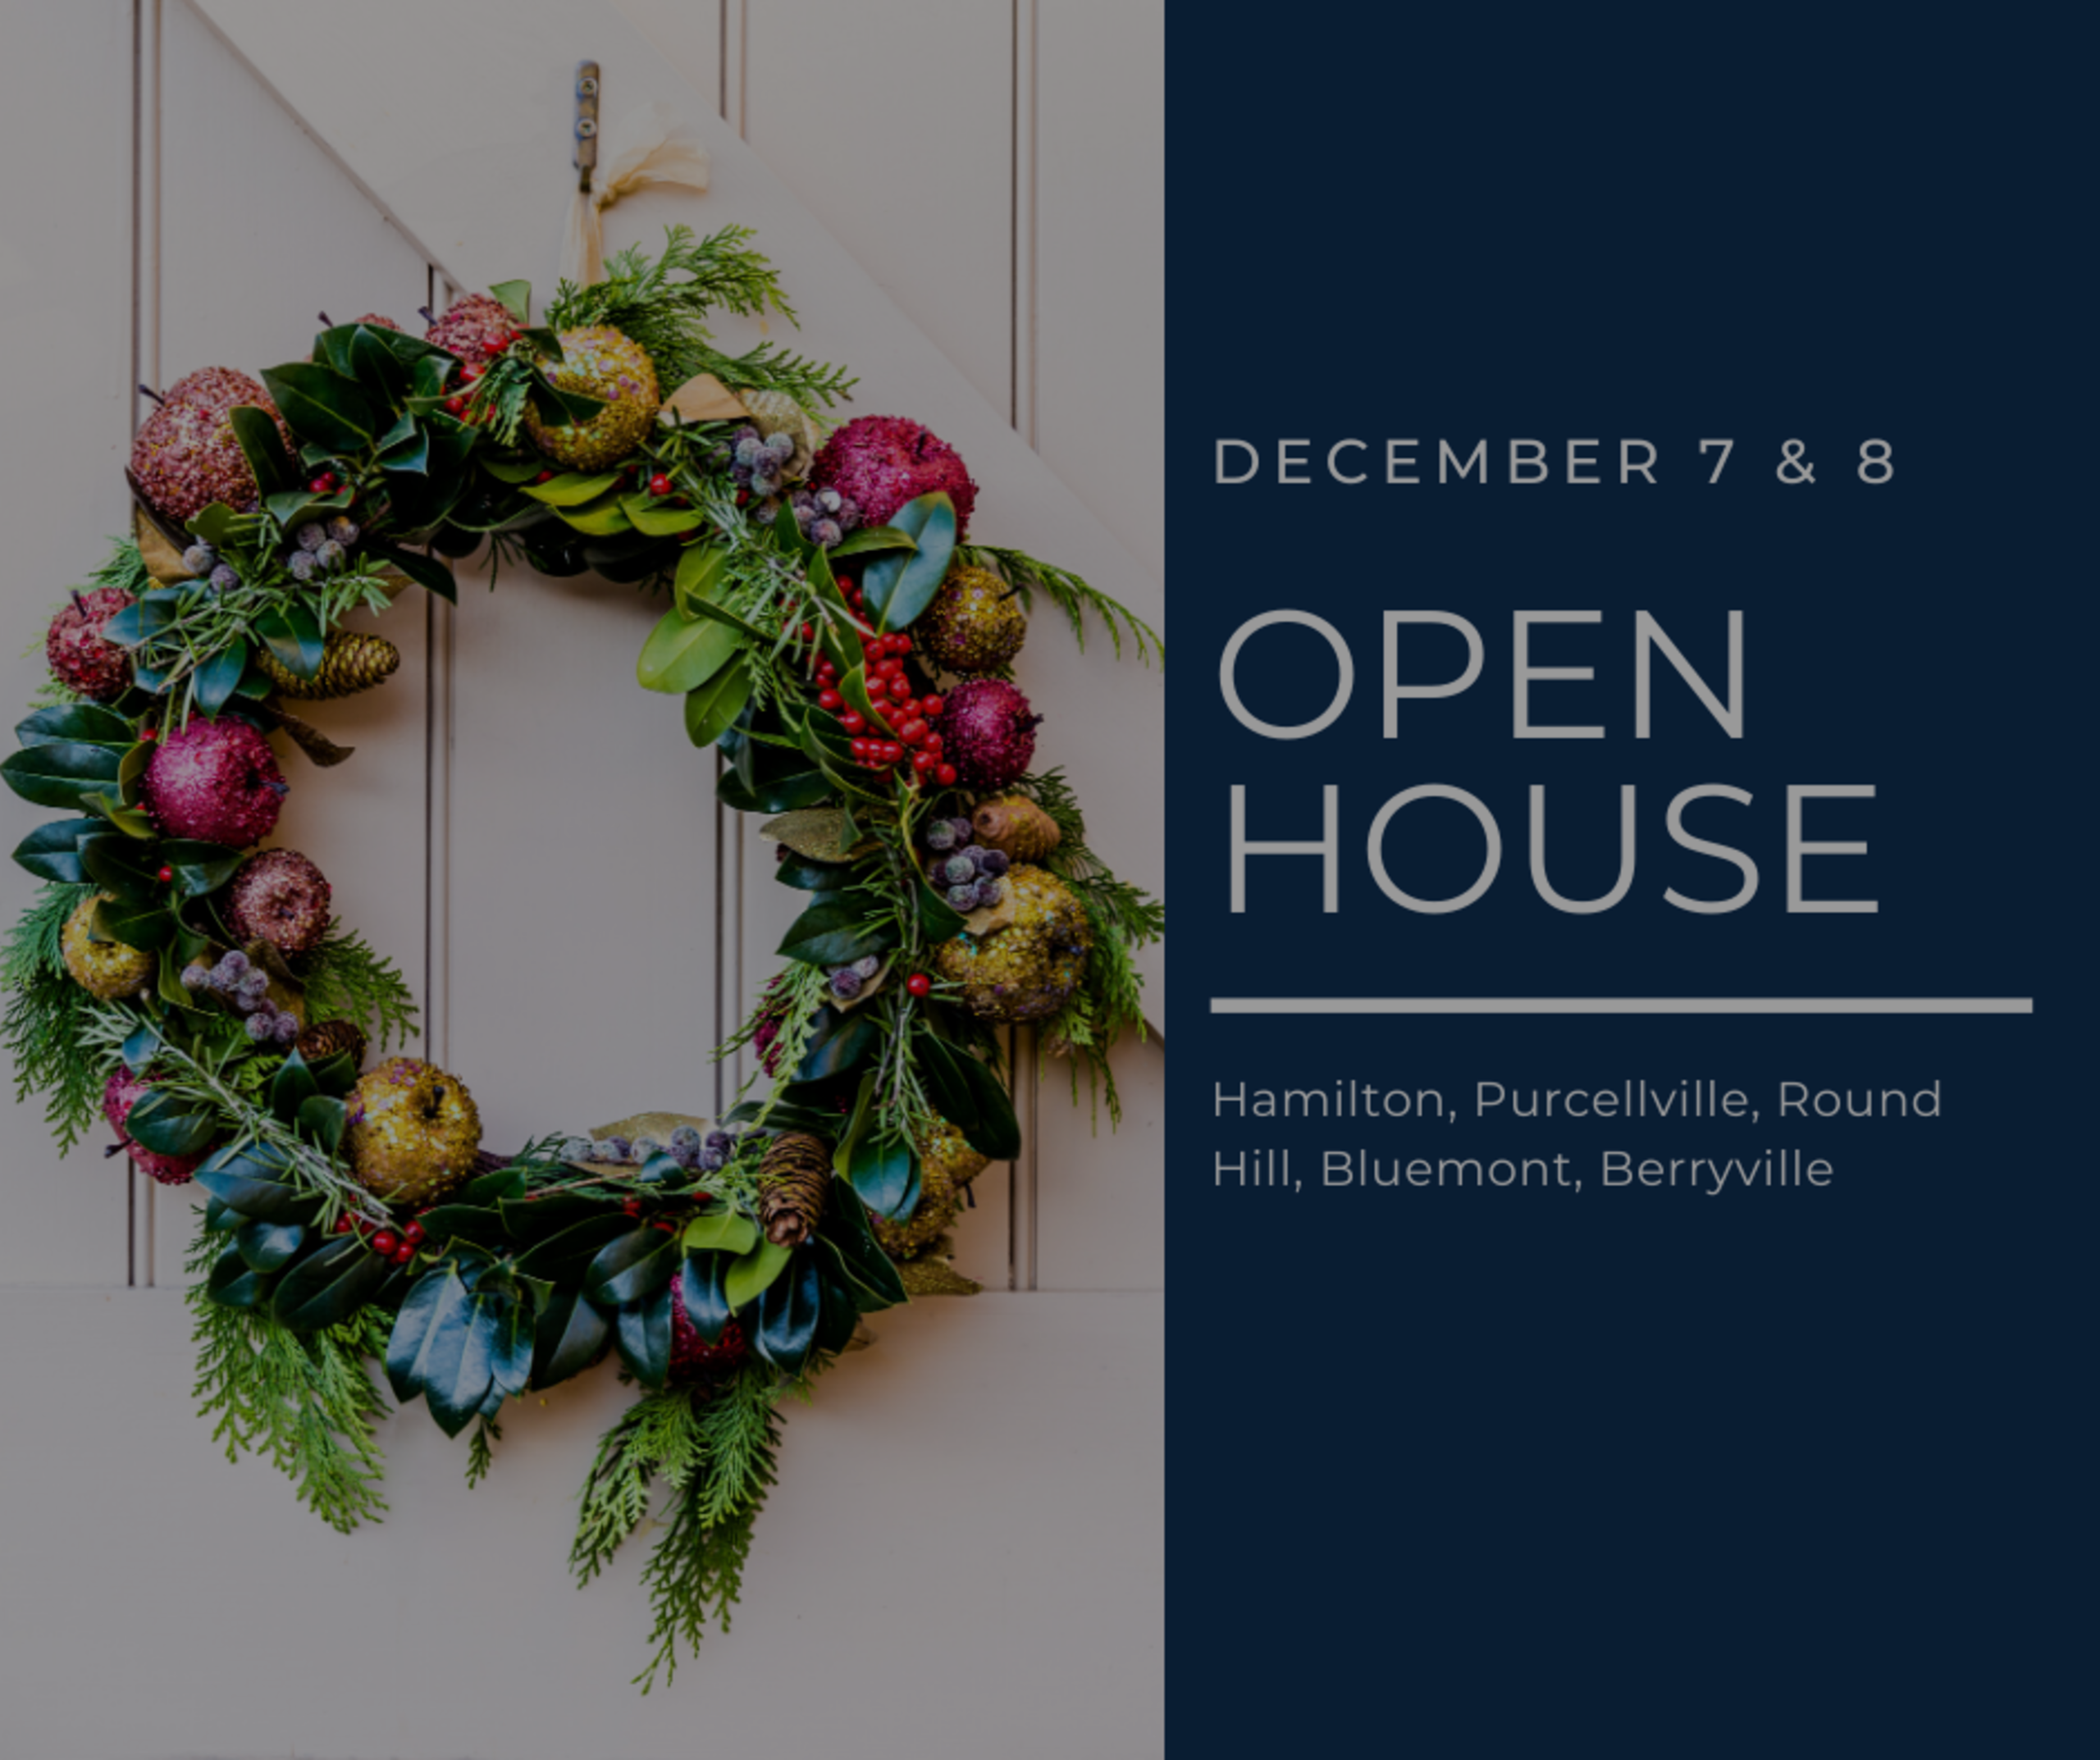 Open House List 12/7/19 – 12/8/19